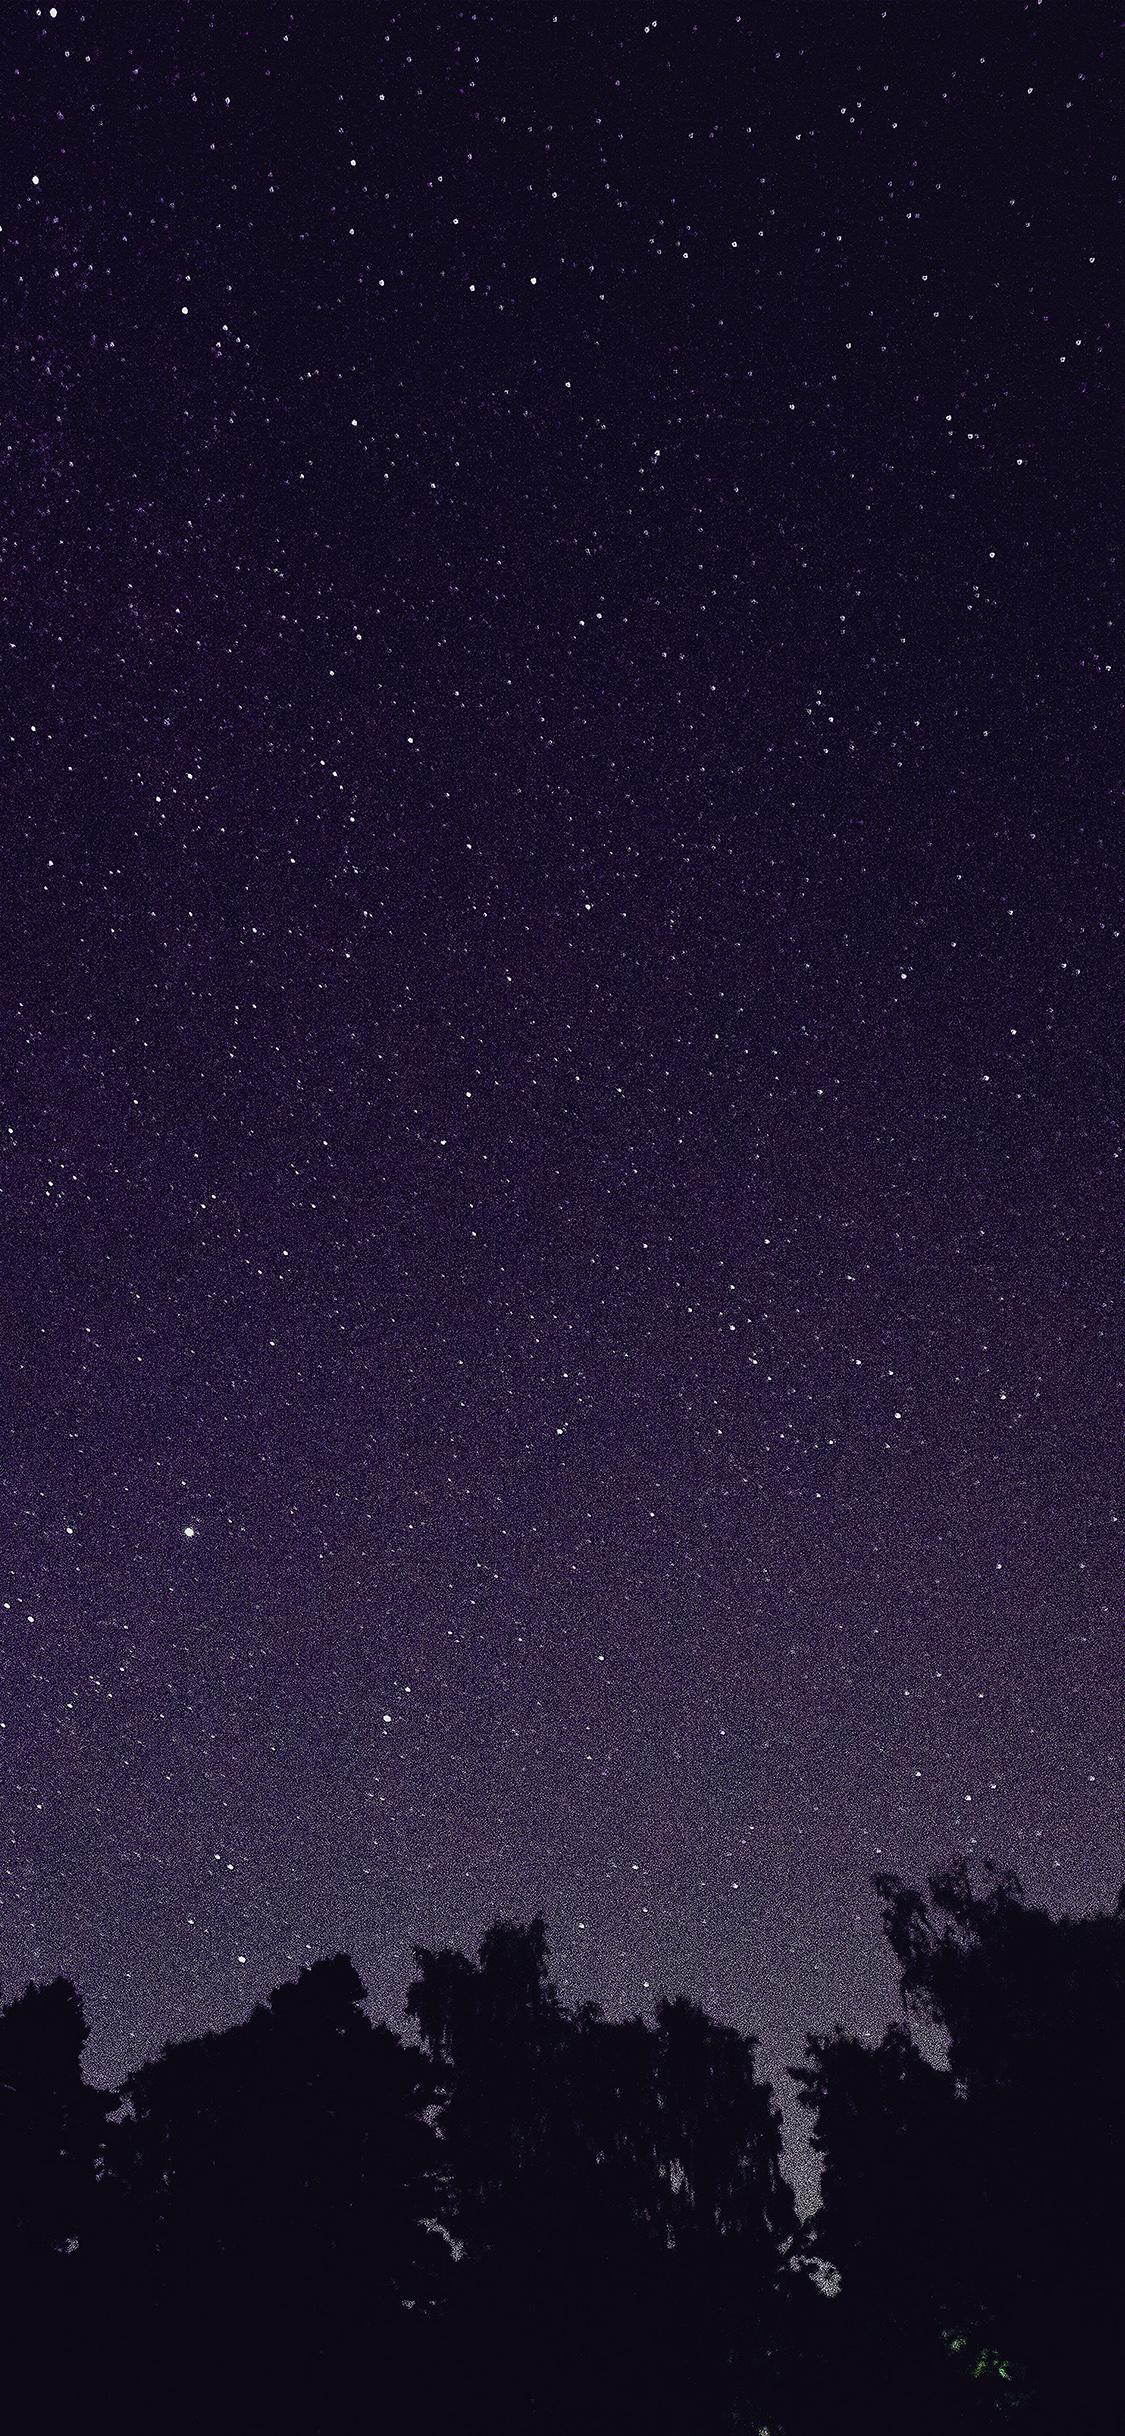 mt41-starry-night-sky-star-galaxy-space-dark-purple-wallpaper